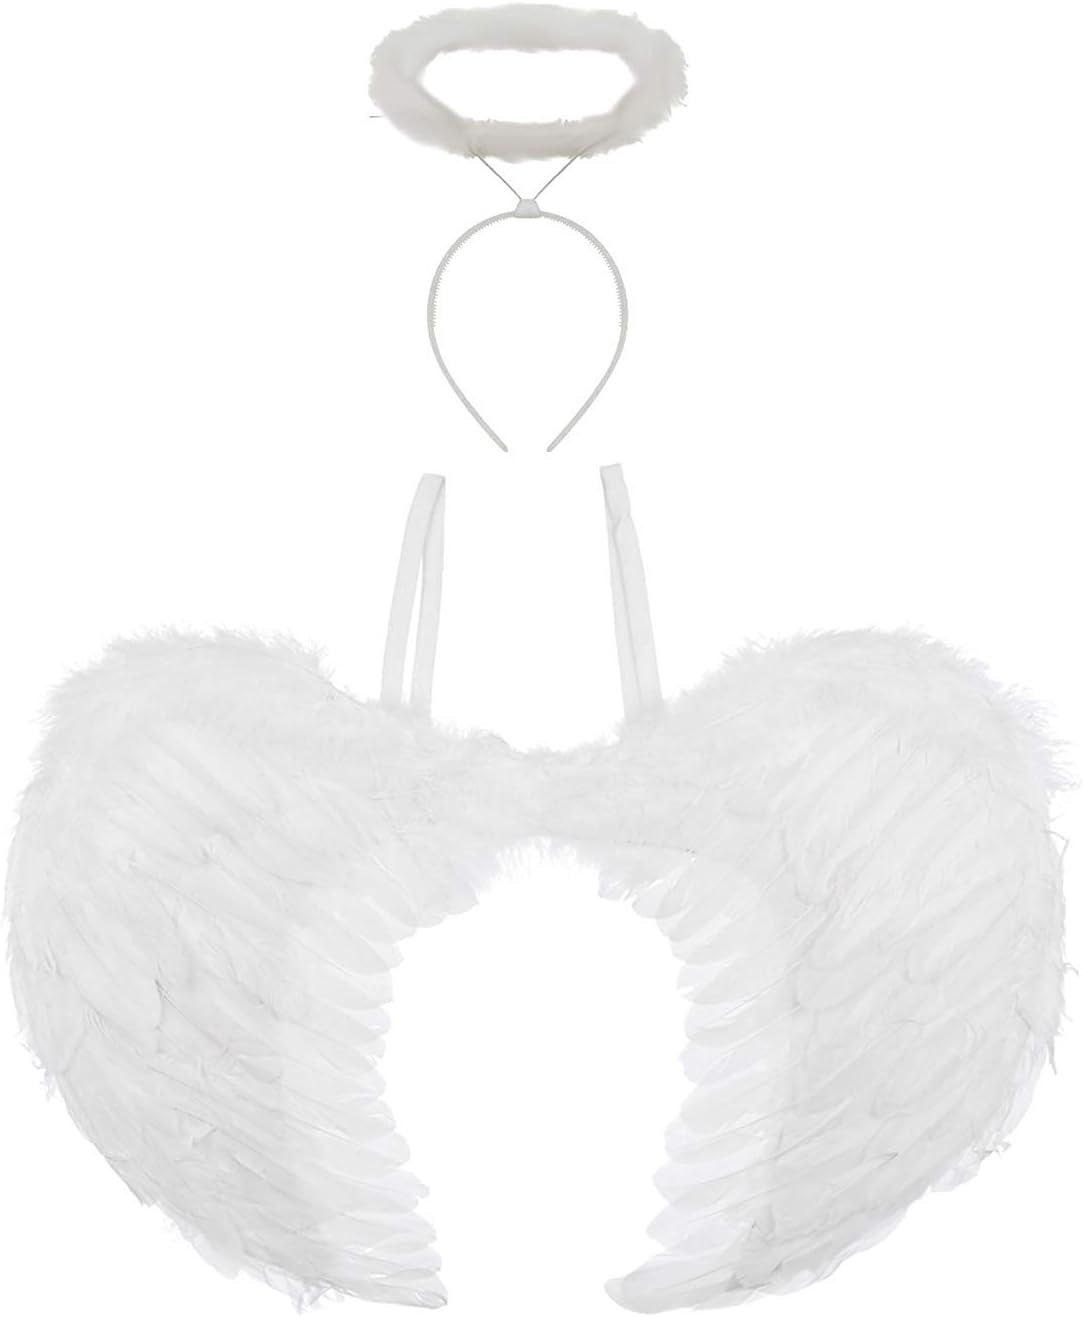 Redstar Fancy Dress - Alas y halo de ángel - Ideal para Halloween - Blanco